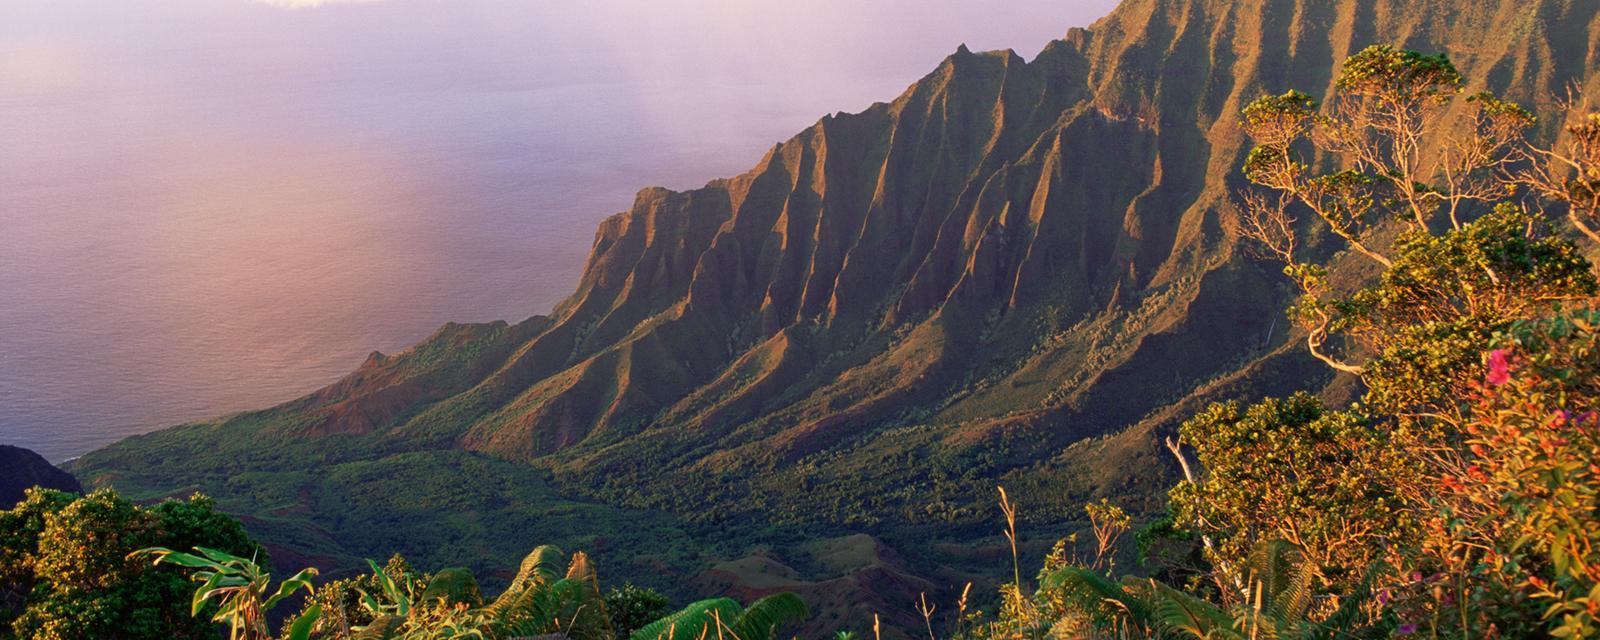 Earth - Hawaii: The islands where evolution ran riot